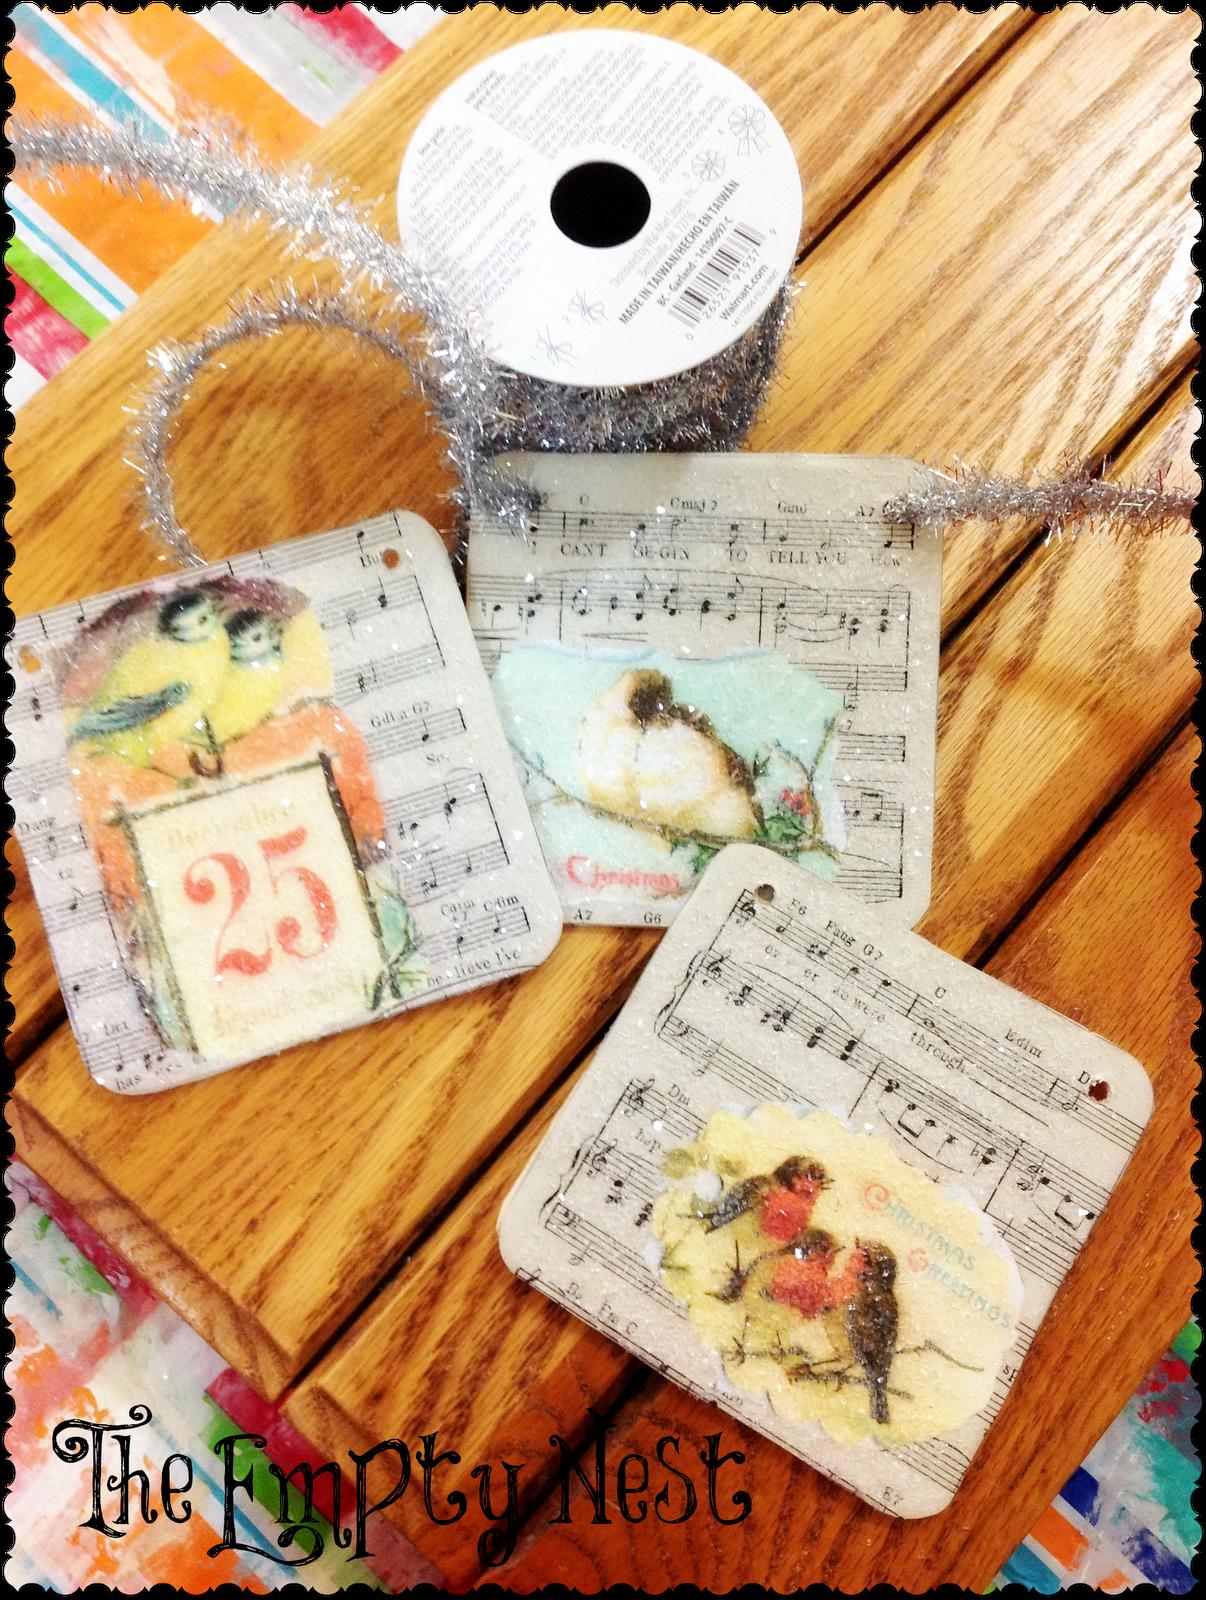 Empty Nest Christmas Card Ideas : empty, christmas, ideas, Getting, Ready, Holidays, Vintage, Christmas, Cards,, Sheet, Music, Crafts,